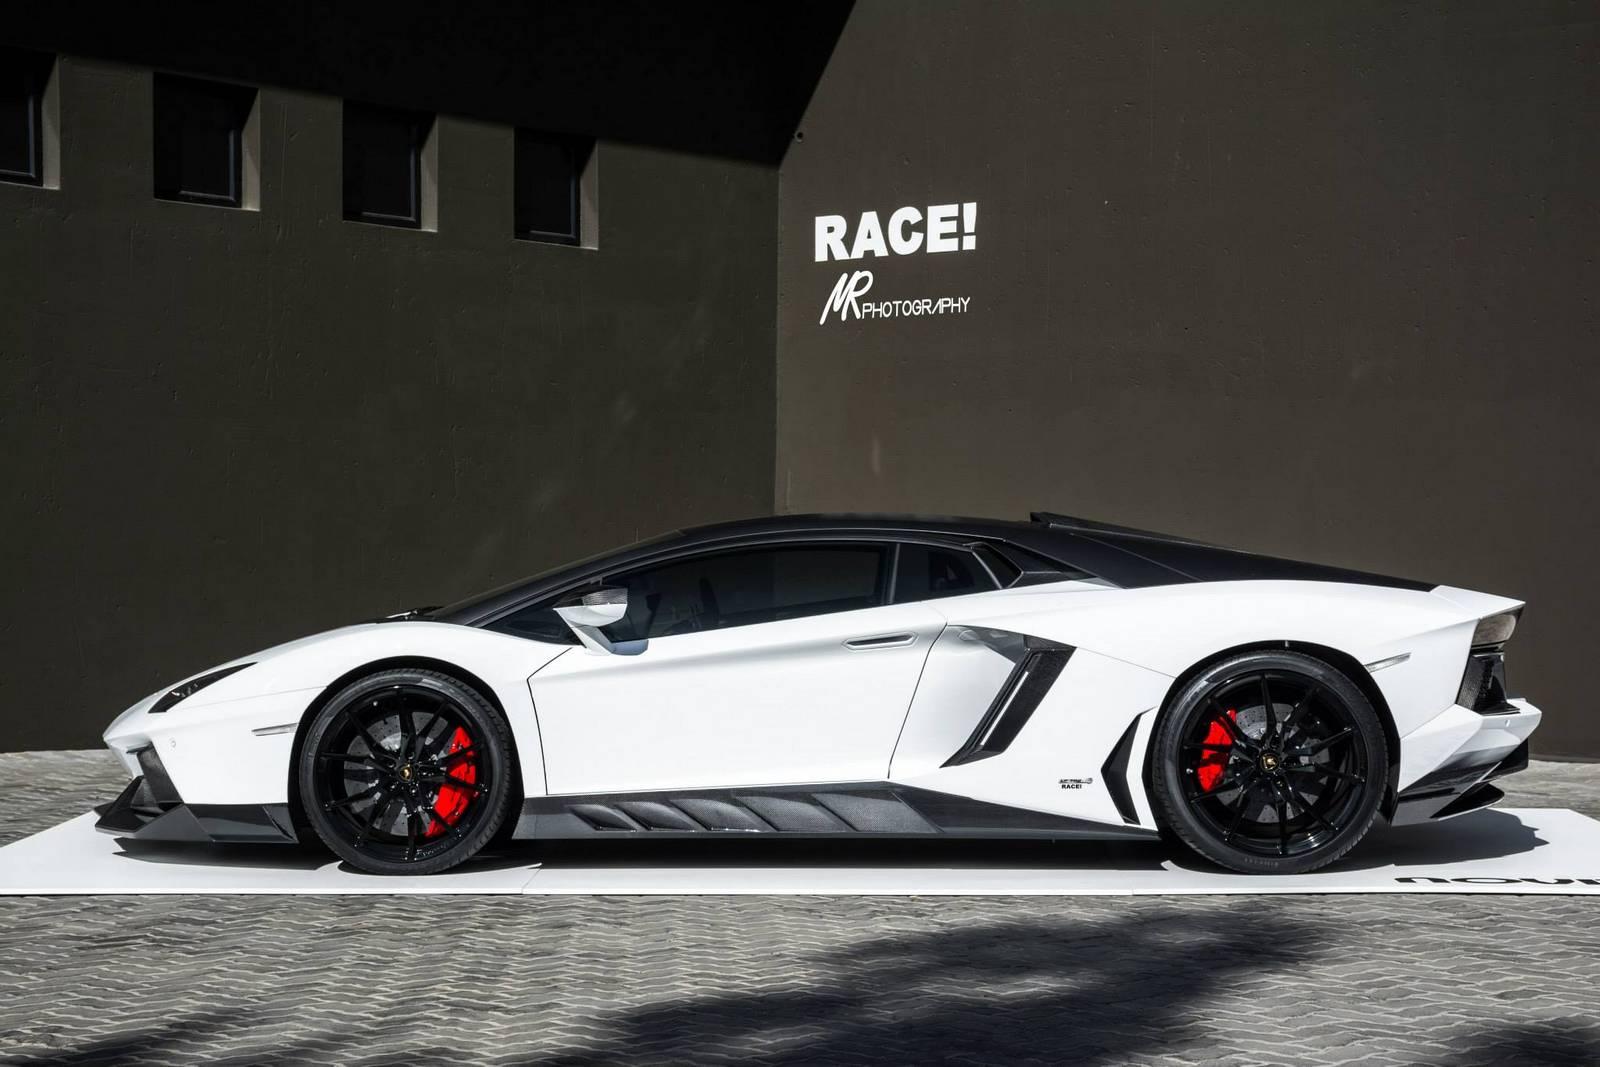 Lamborghini Novitec Torado Backgrounds on Wallpapers Vista